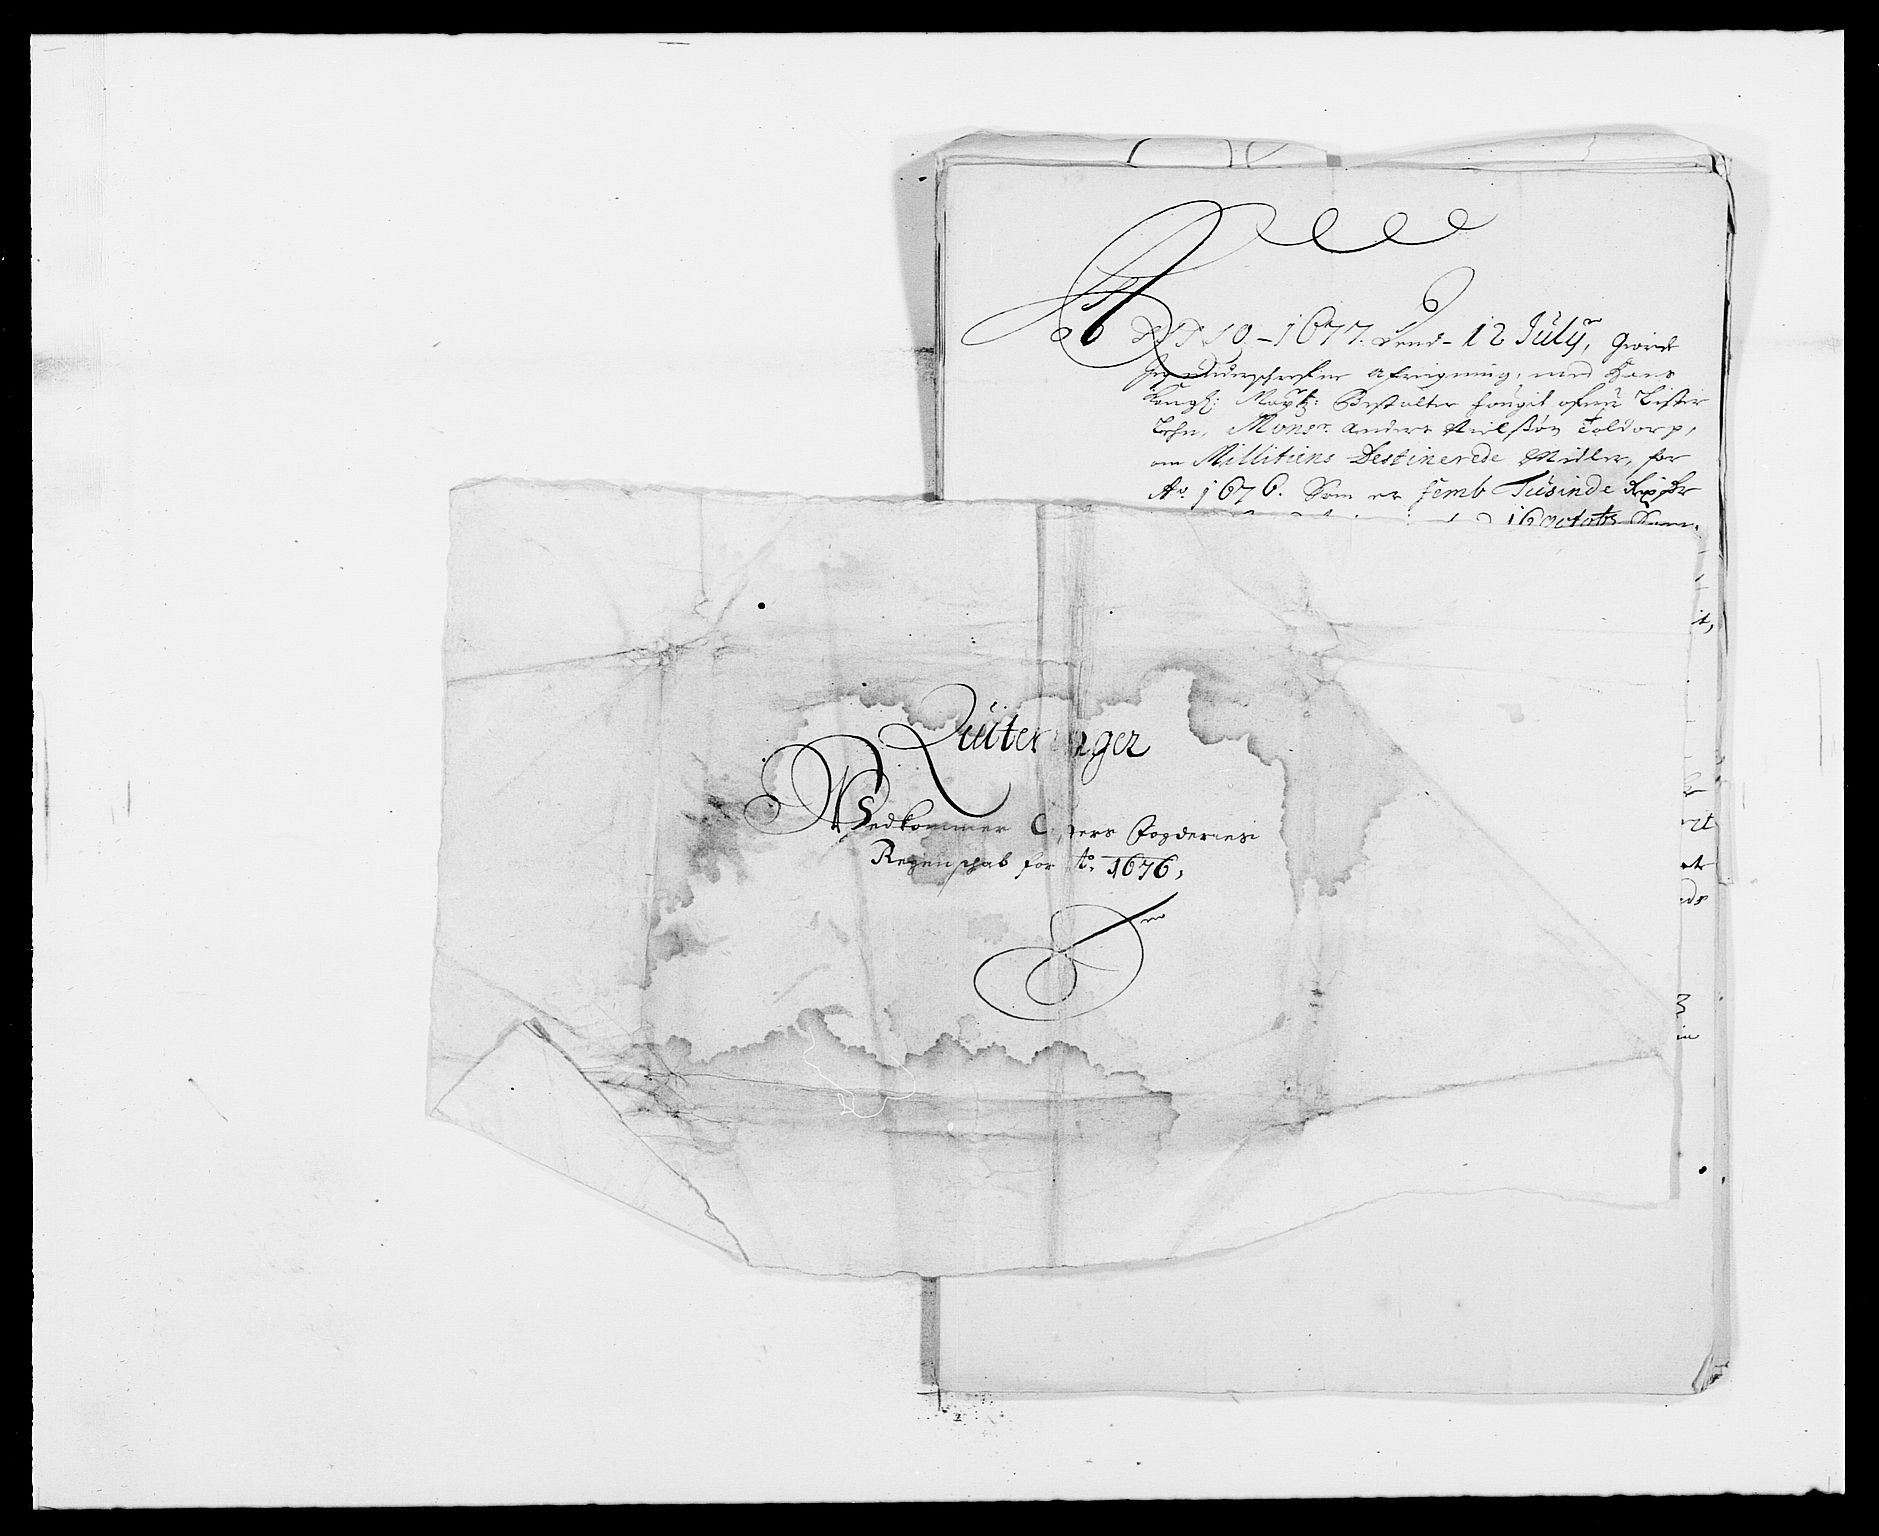 RA, Rentekammeret inntil 1814, Reviderte regnskaper, Fogderegnskap, R41/L2529: Fogderegnskap Lista, 1675-1676, s. 213